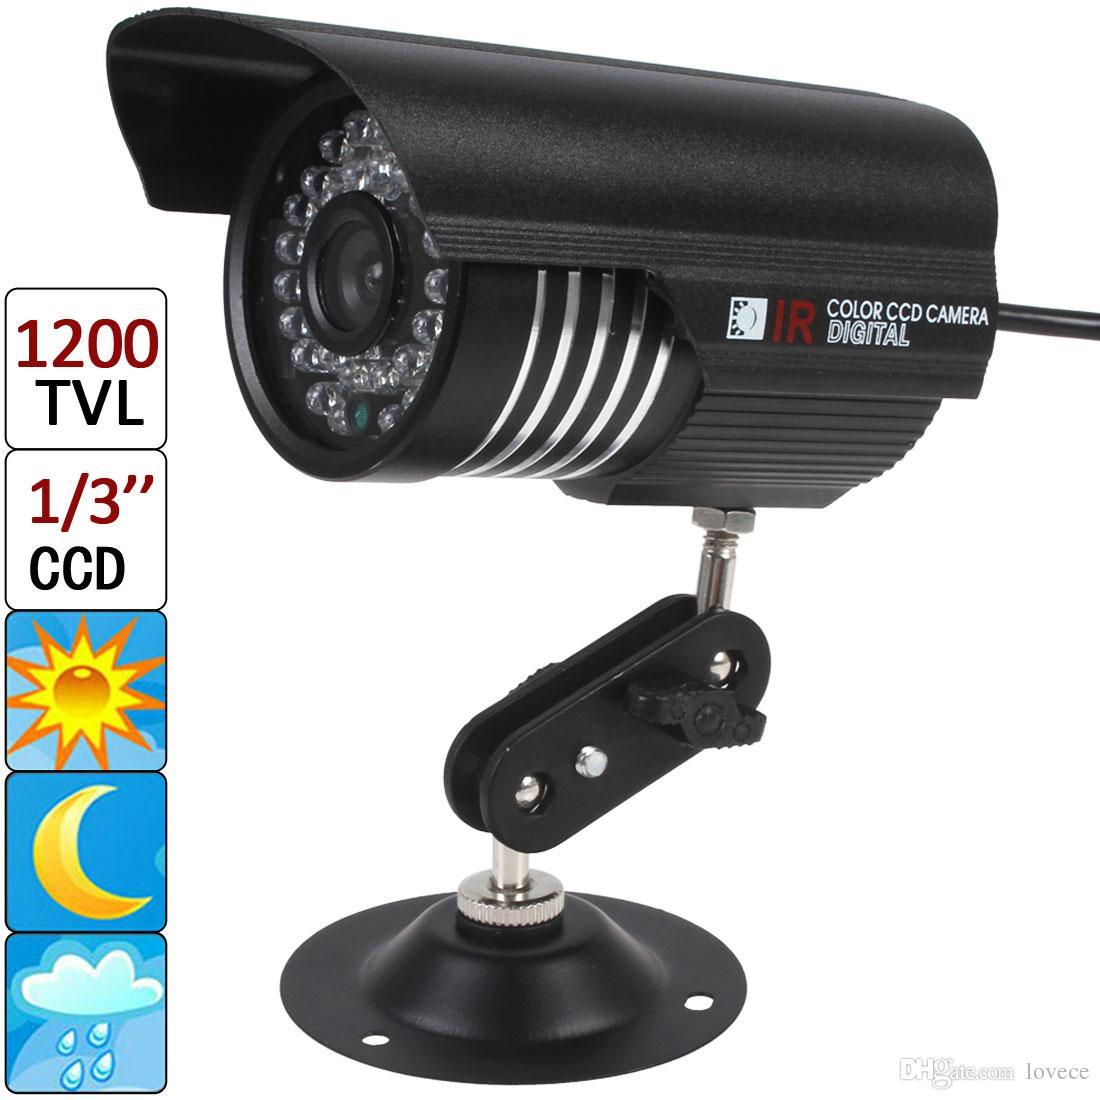 1200 TVL 6mm Lens 36 IR LED IP66 Impermeabile Night Vision Telecamera bullet CCTV con sensore 1/3